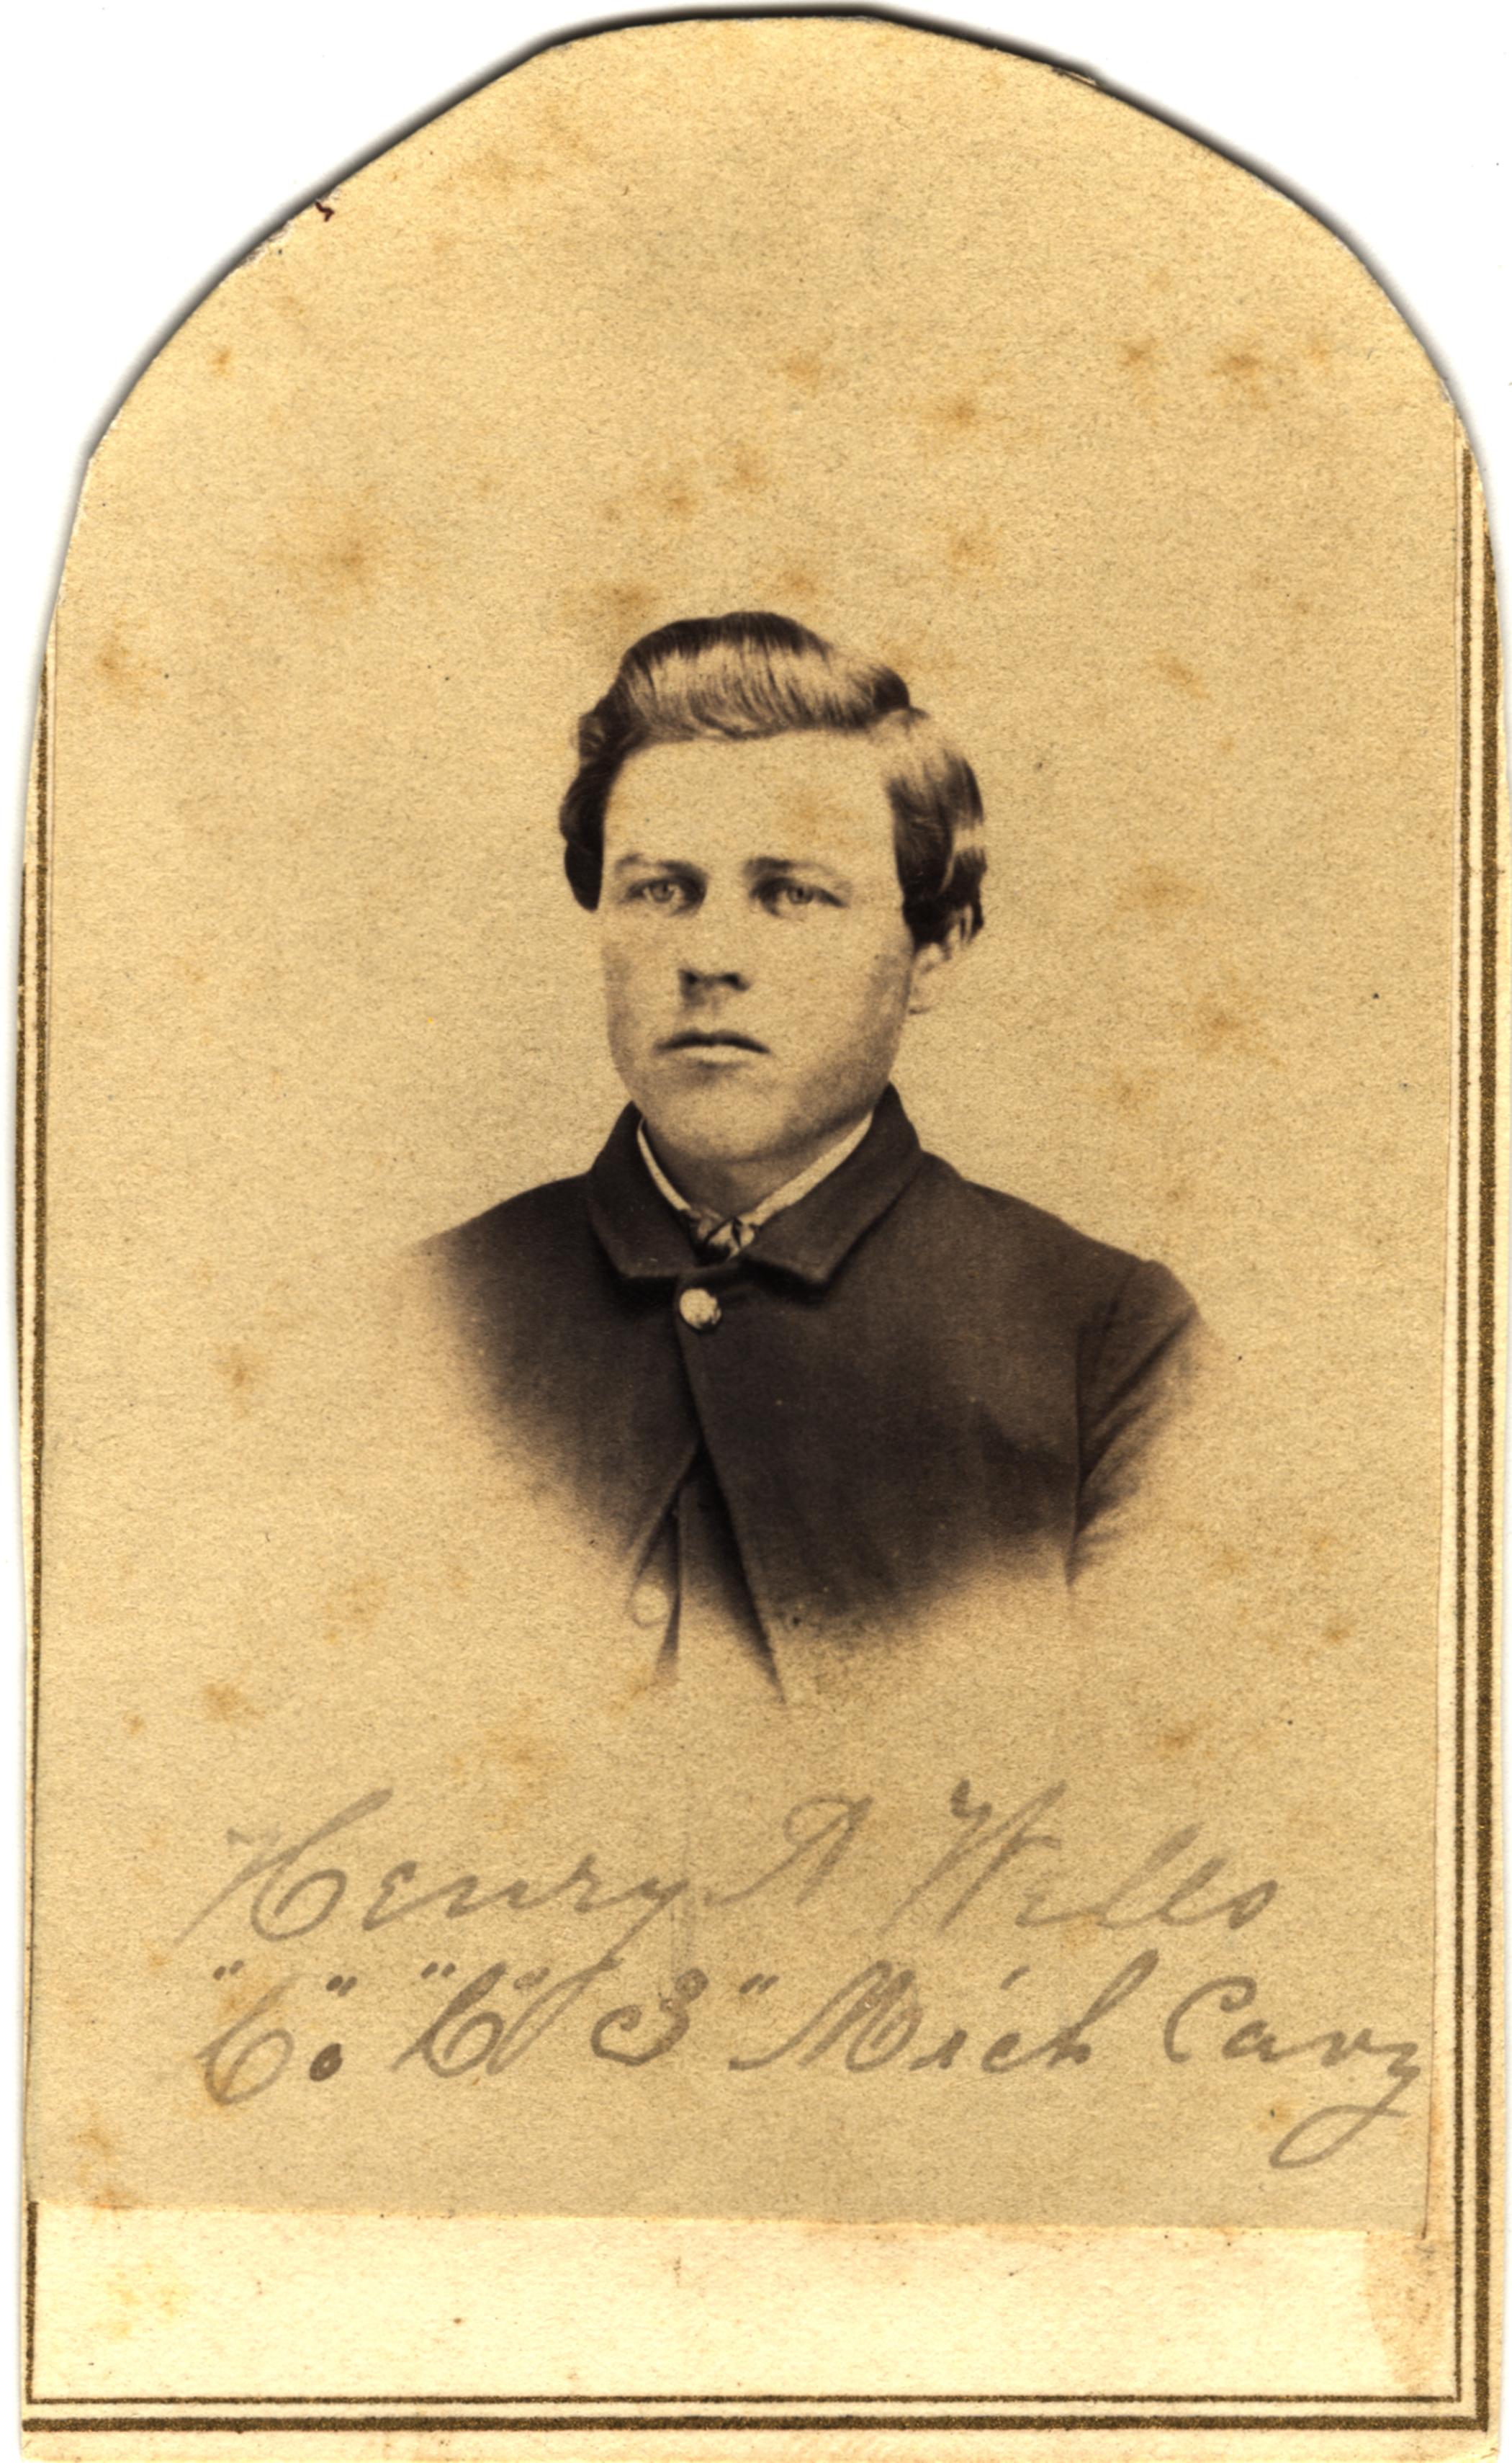 Henry A. Wells, circa 1860s